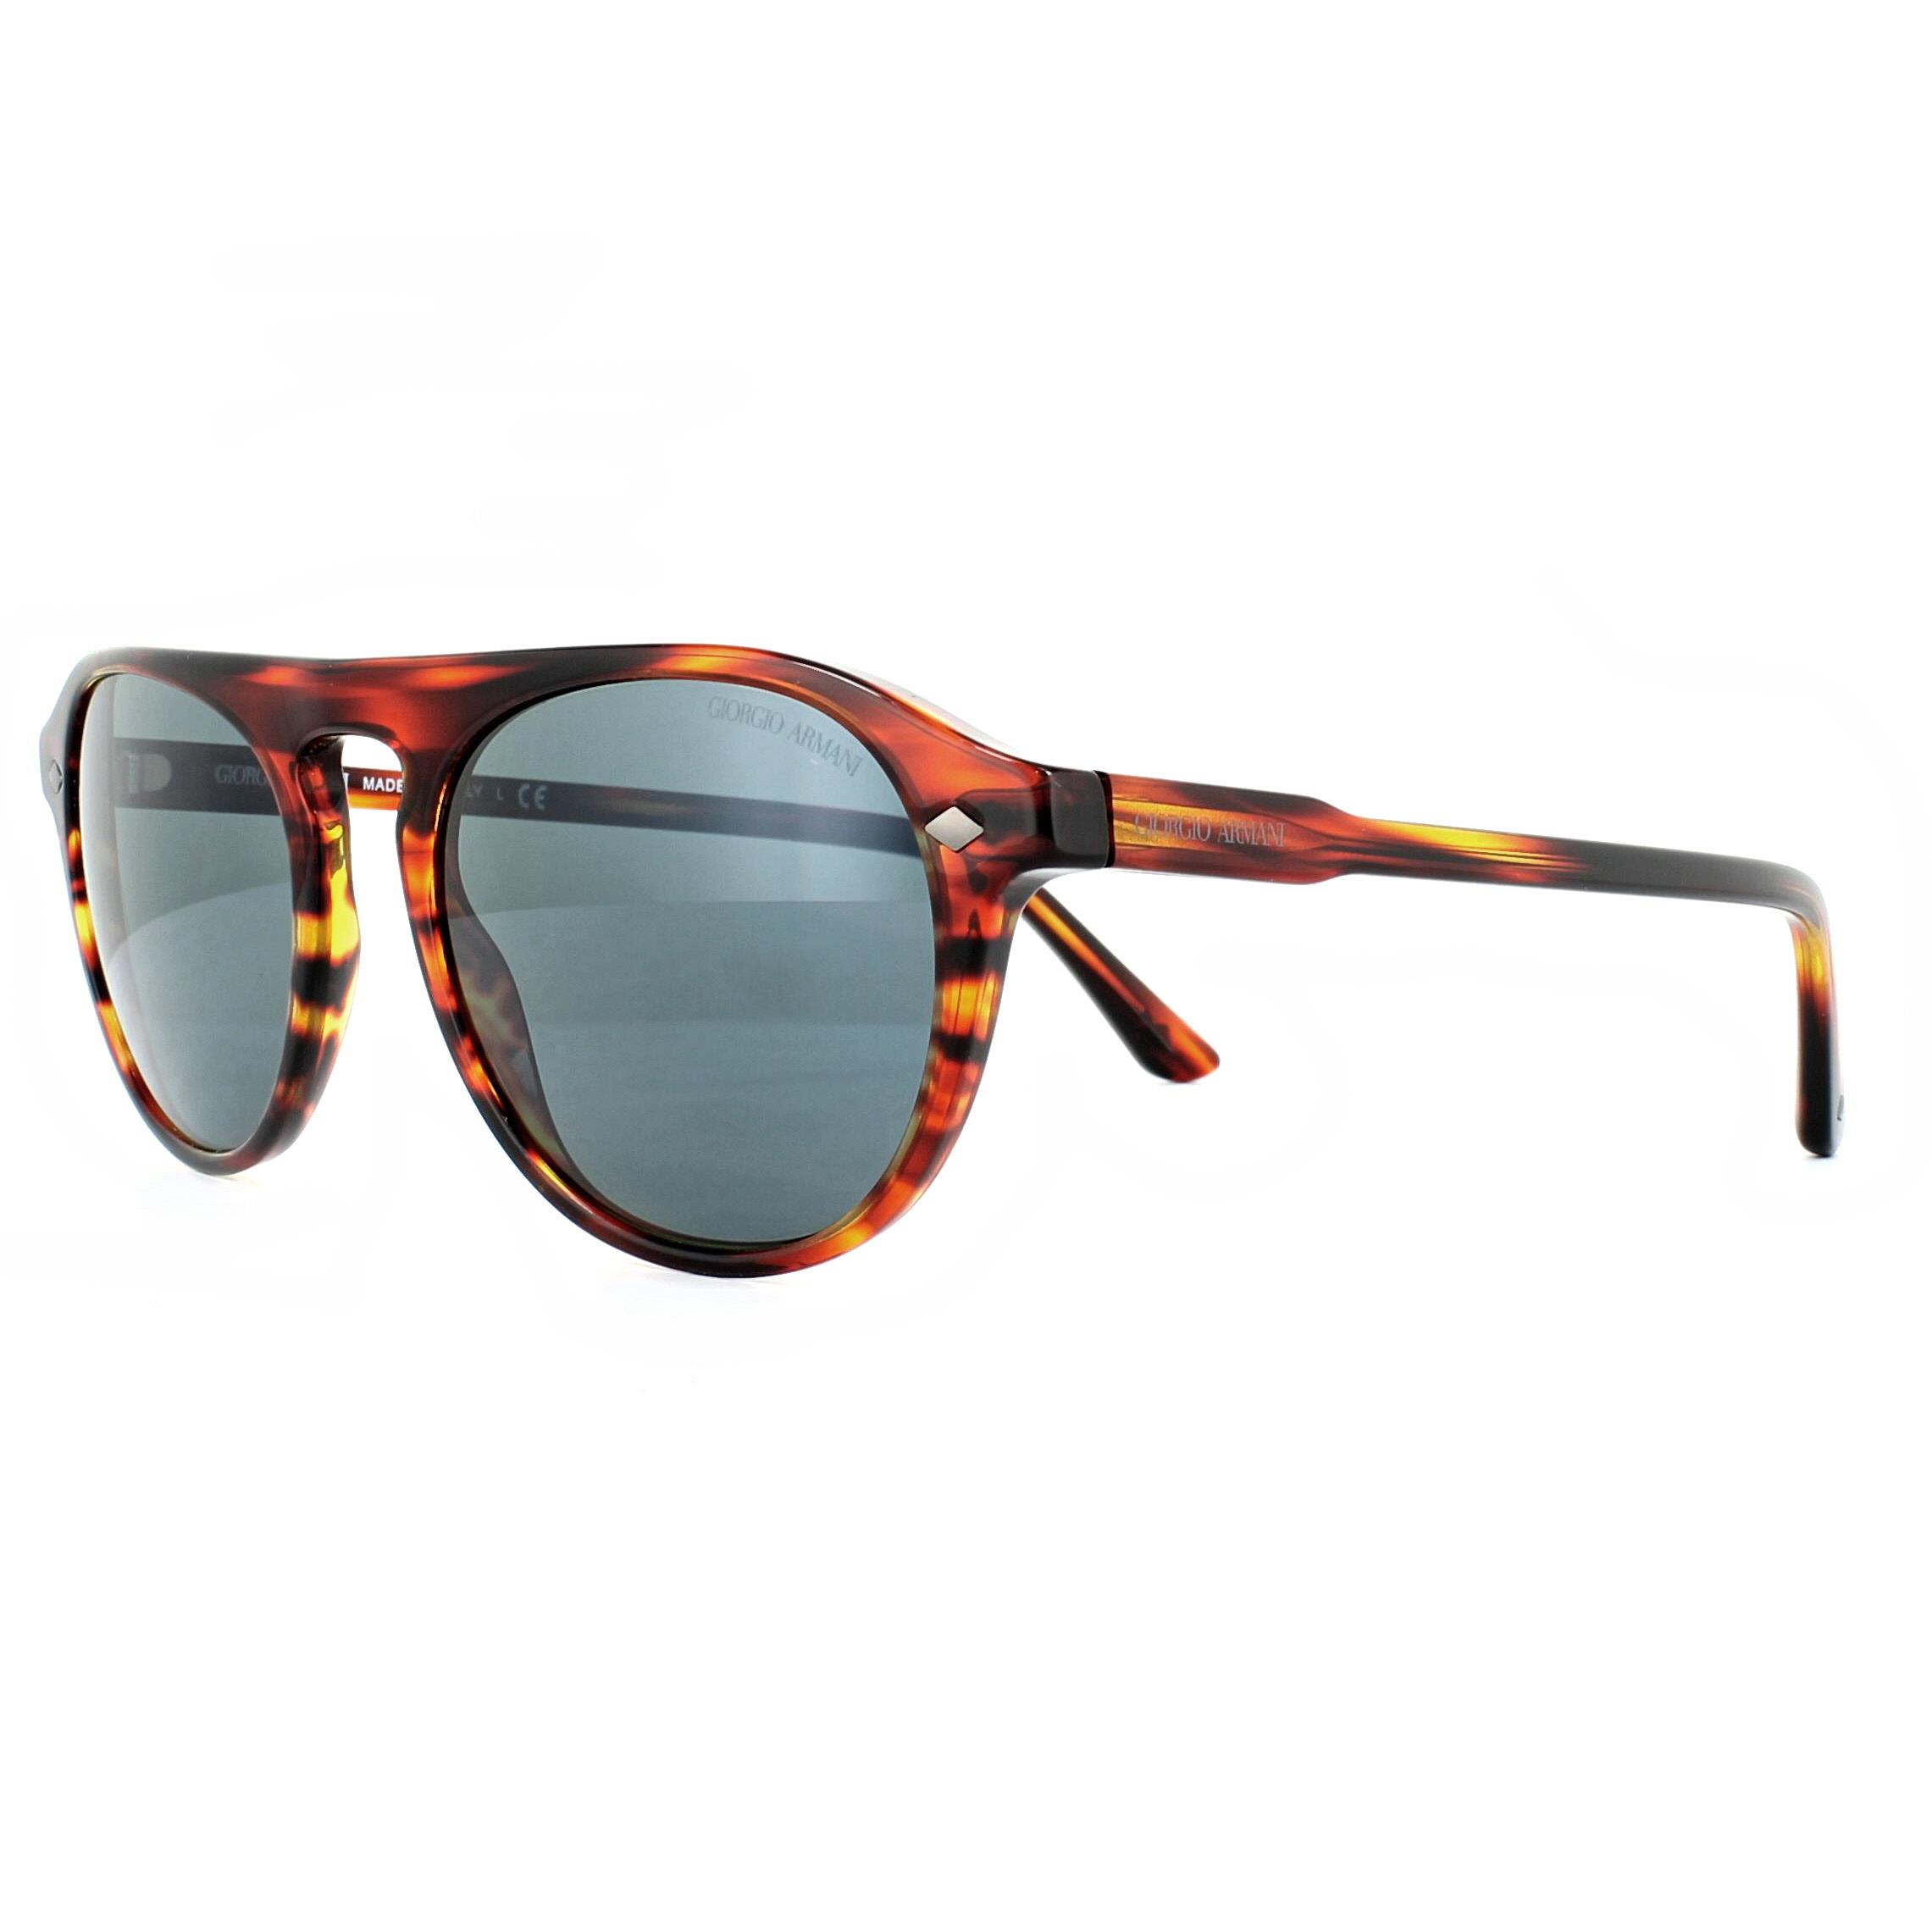 137c299d68ab Sentinel Giorgio Armani Sunglasses AR8096 5580R5 Striped Red Grey